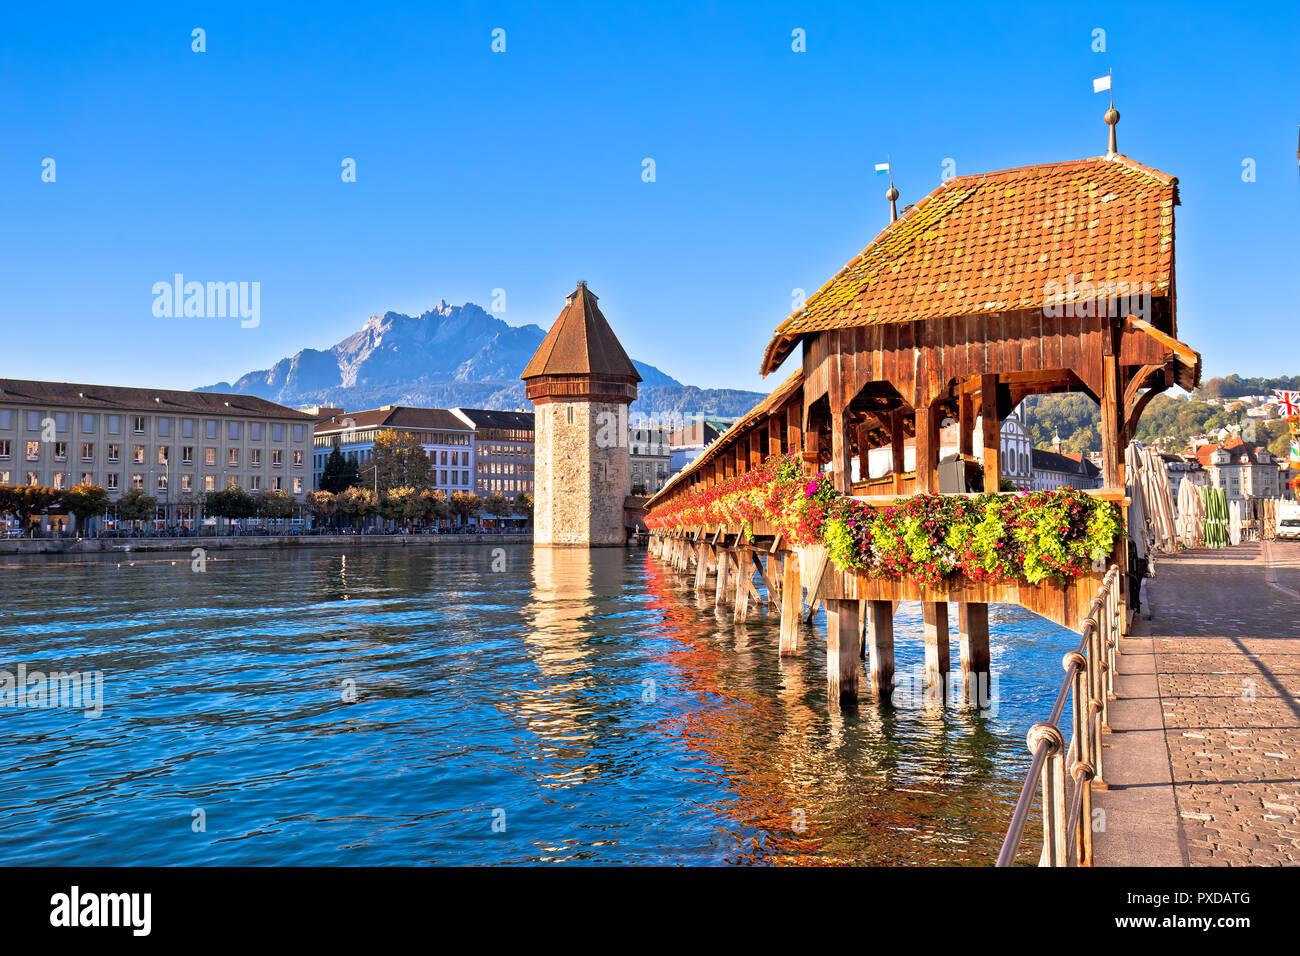 Kapellbrucke historic wooden bridge in Luzern and waterfront landmarks view, town in central Switzerland Stock Photo